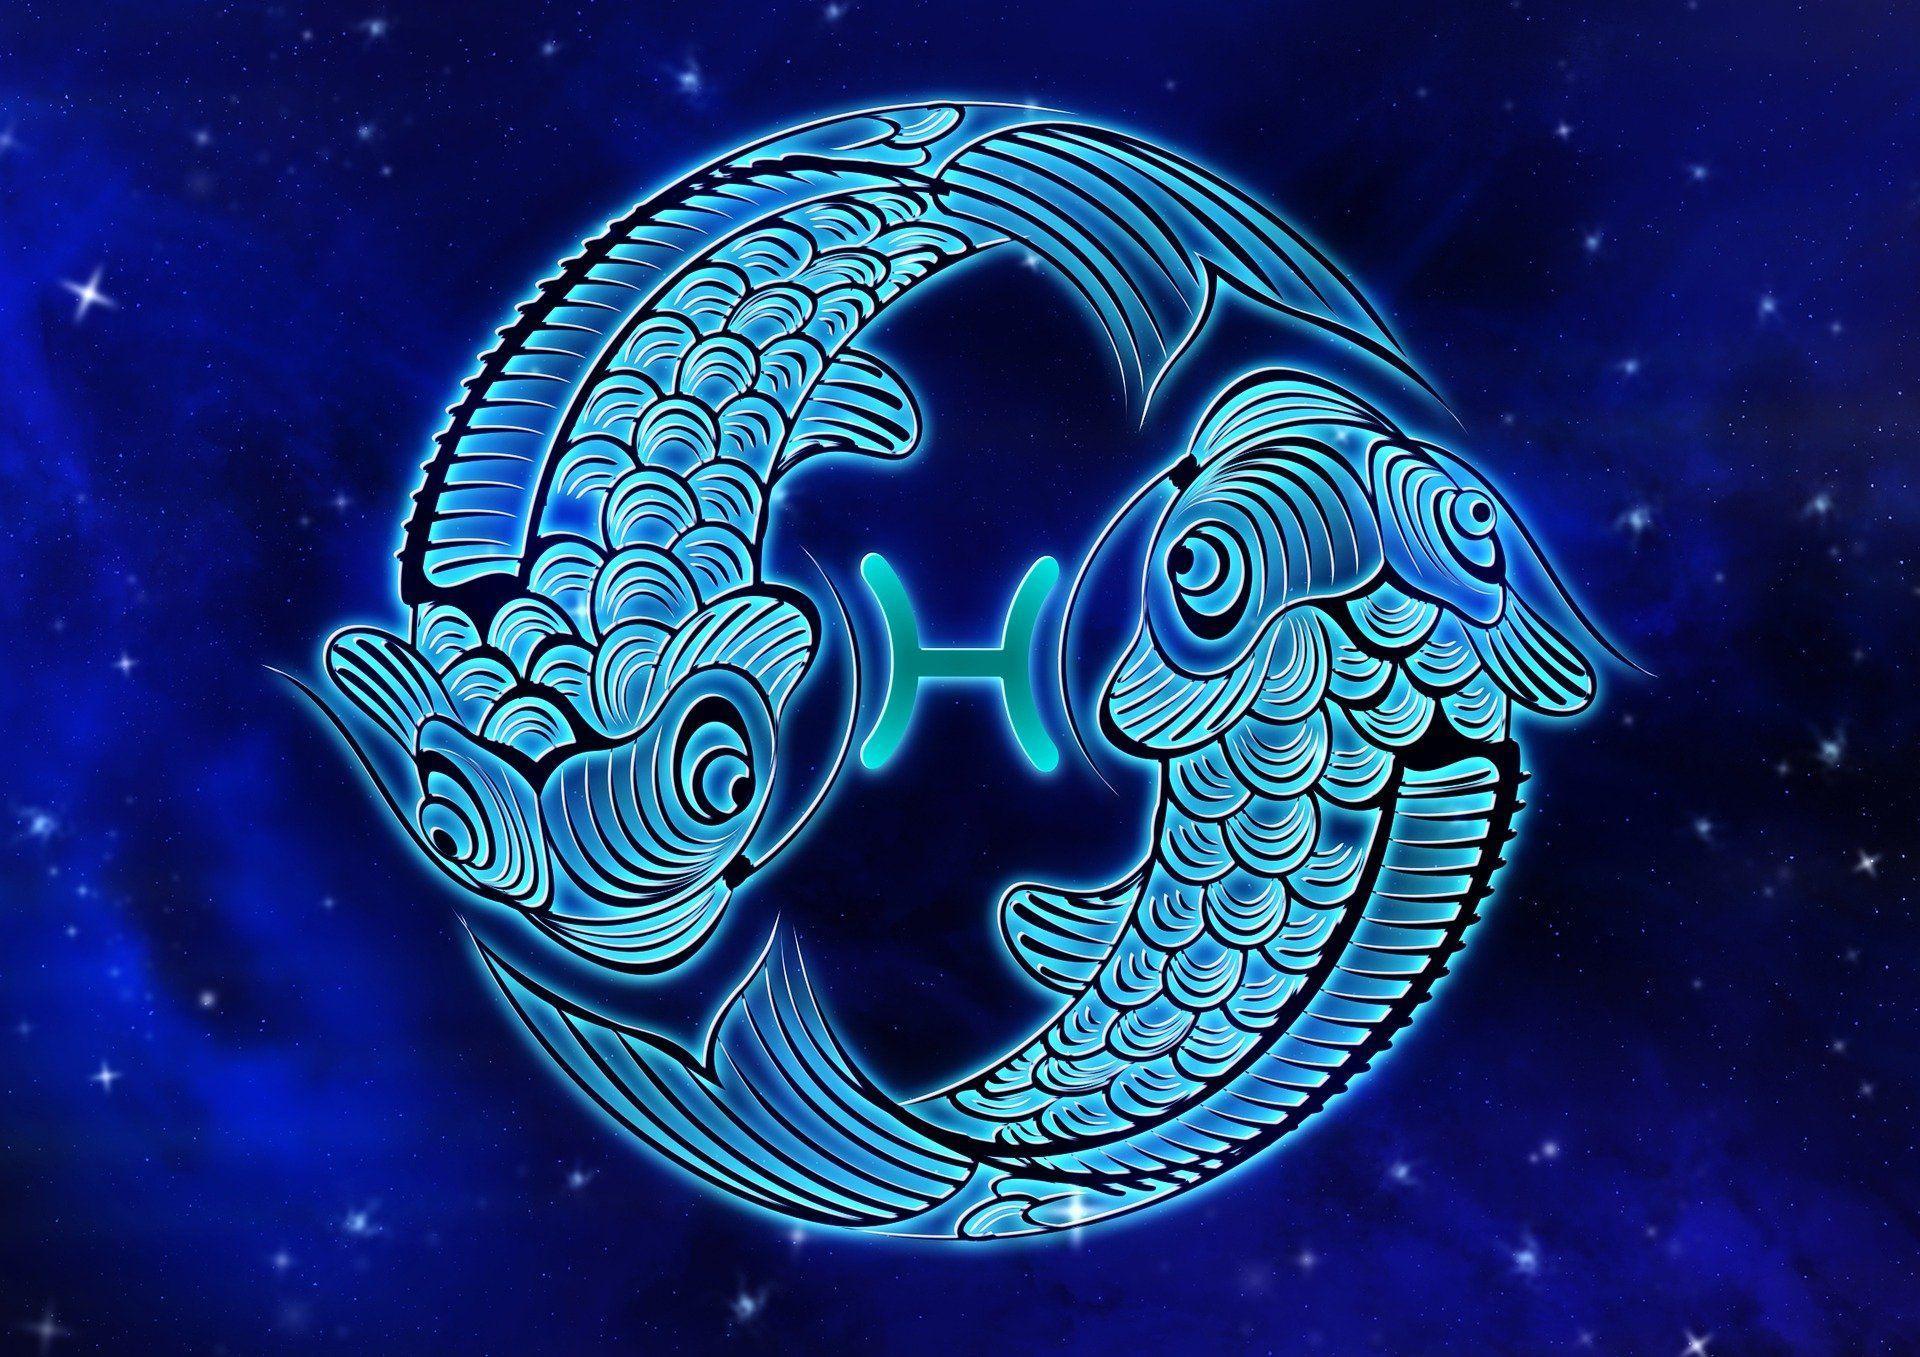 Pisces Zodiac Wallpapers Top Free Pisces Zodiac Backgrounds Wallpaperaccess